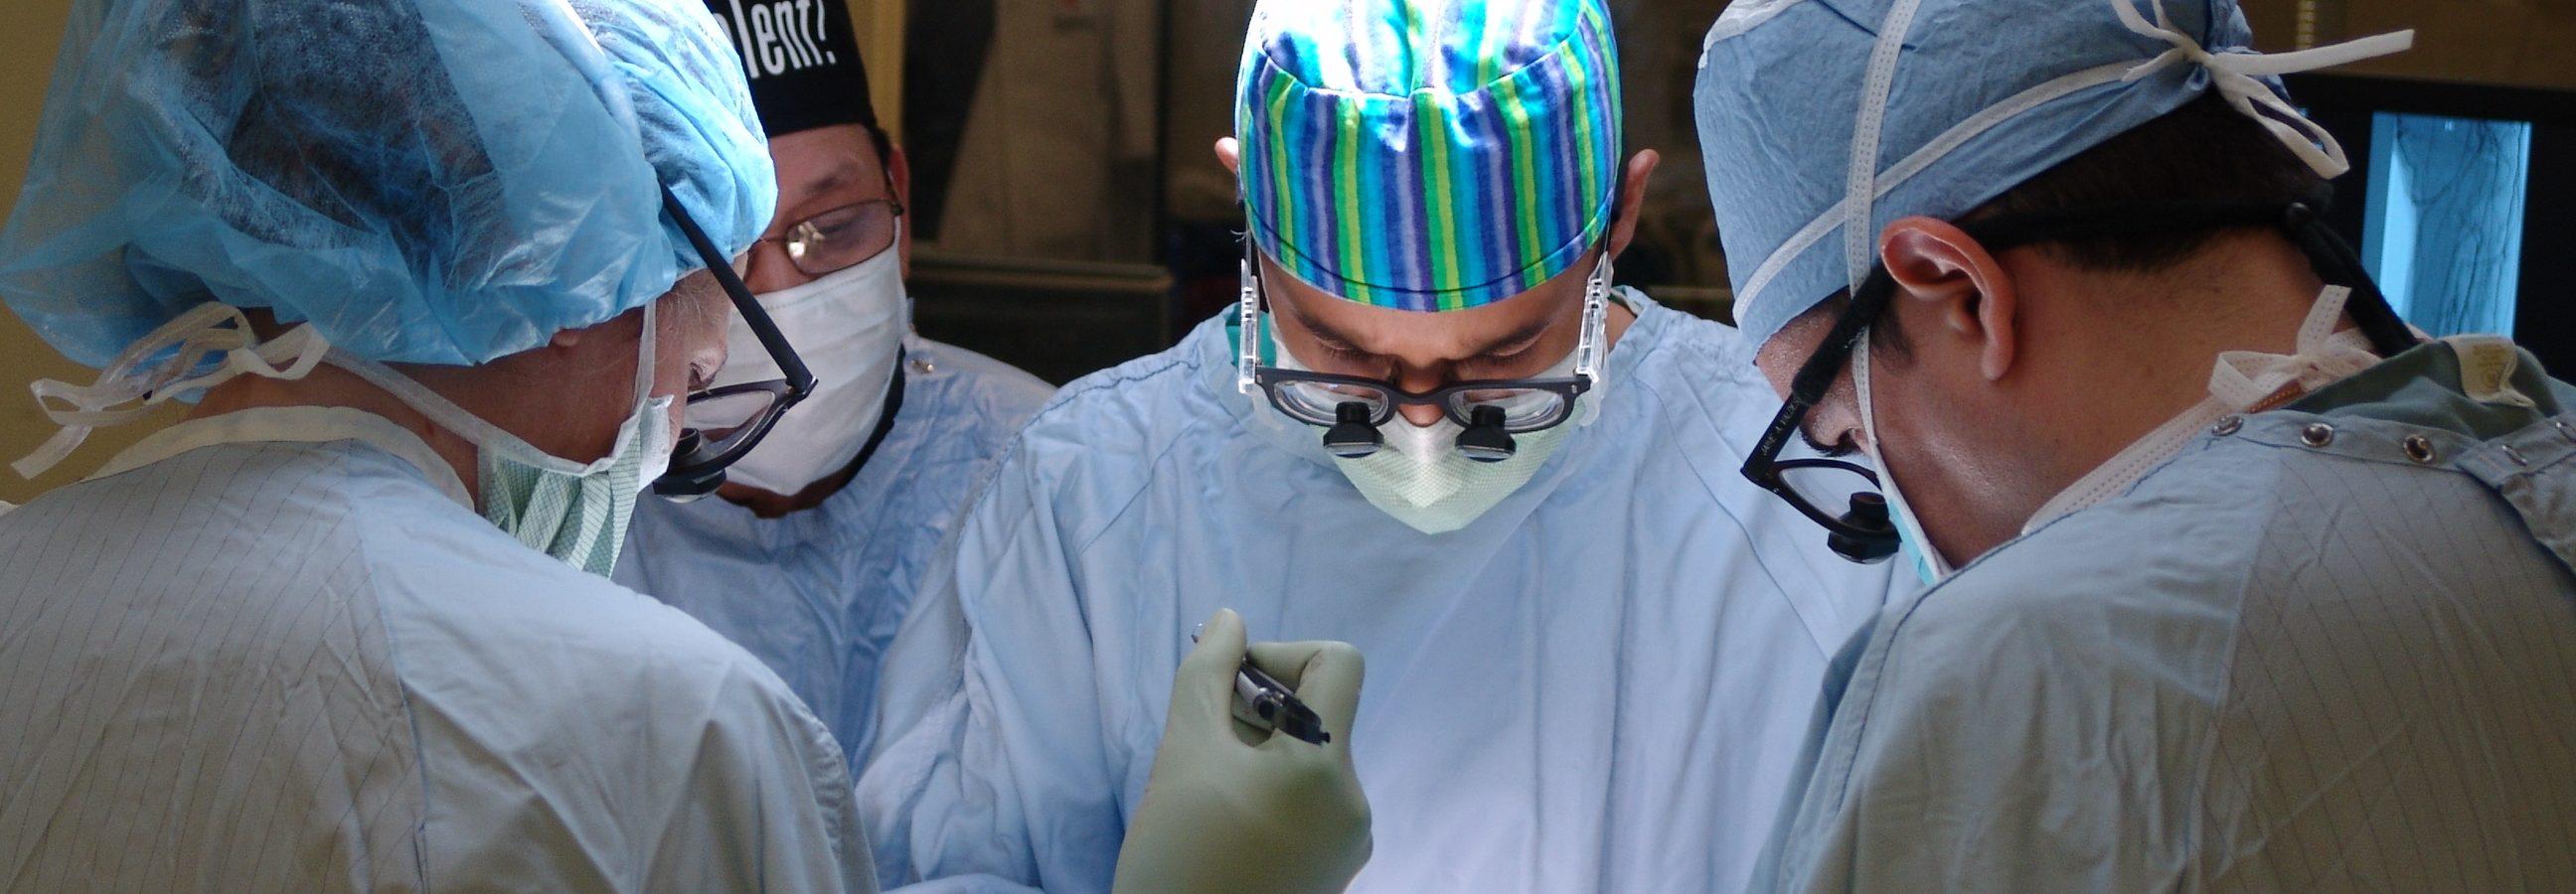 Cardiothoracic & Vascular Surgery | McGovern Medical School